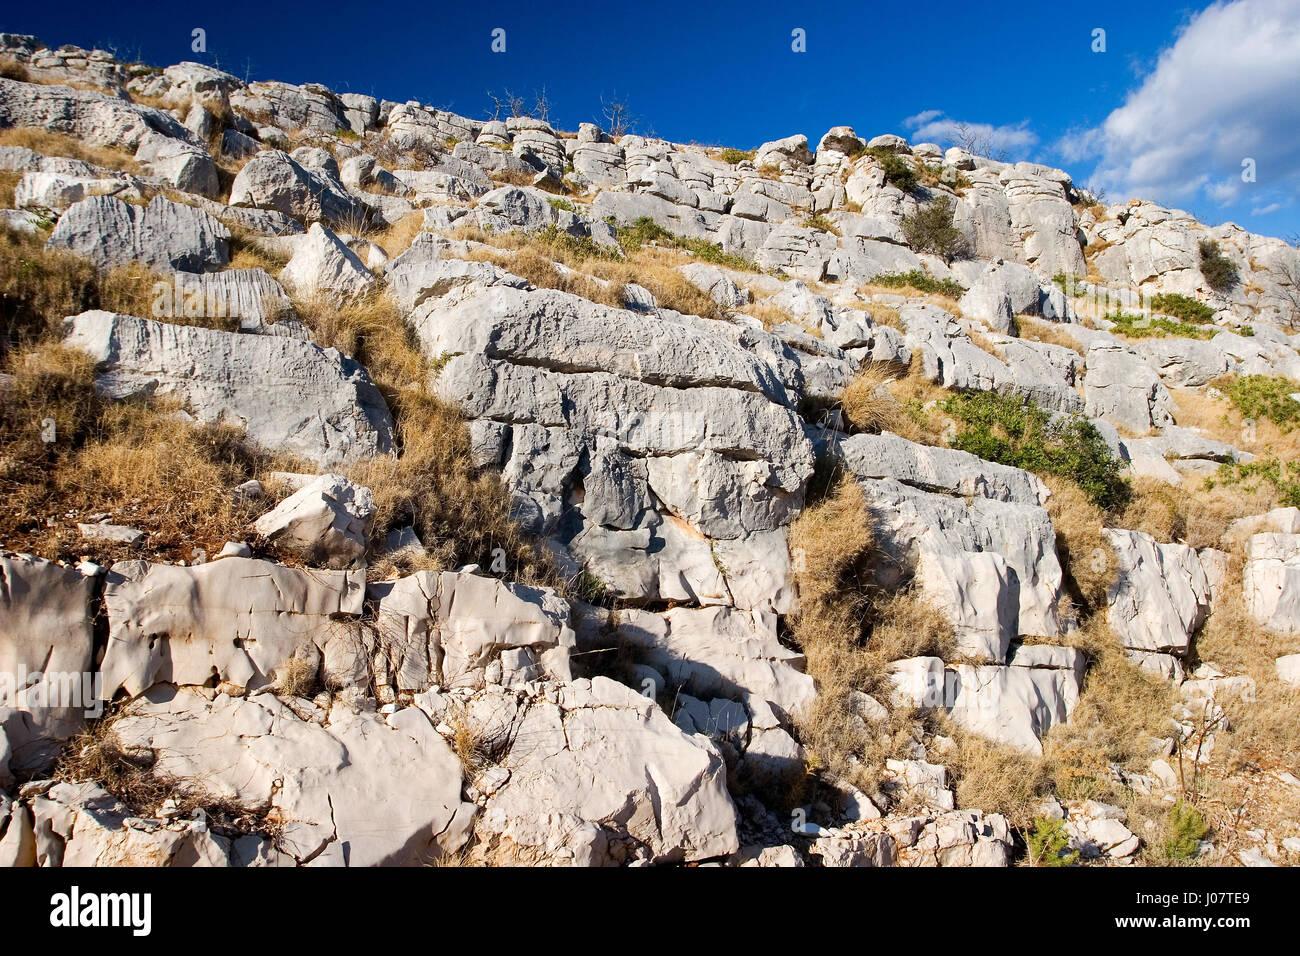 Rocks on Lastovo Island, Croatia - Stock Image